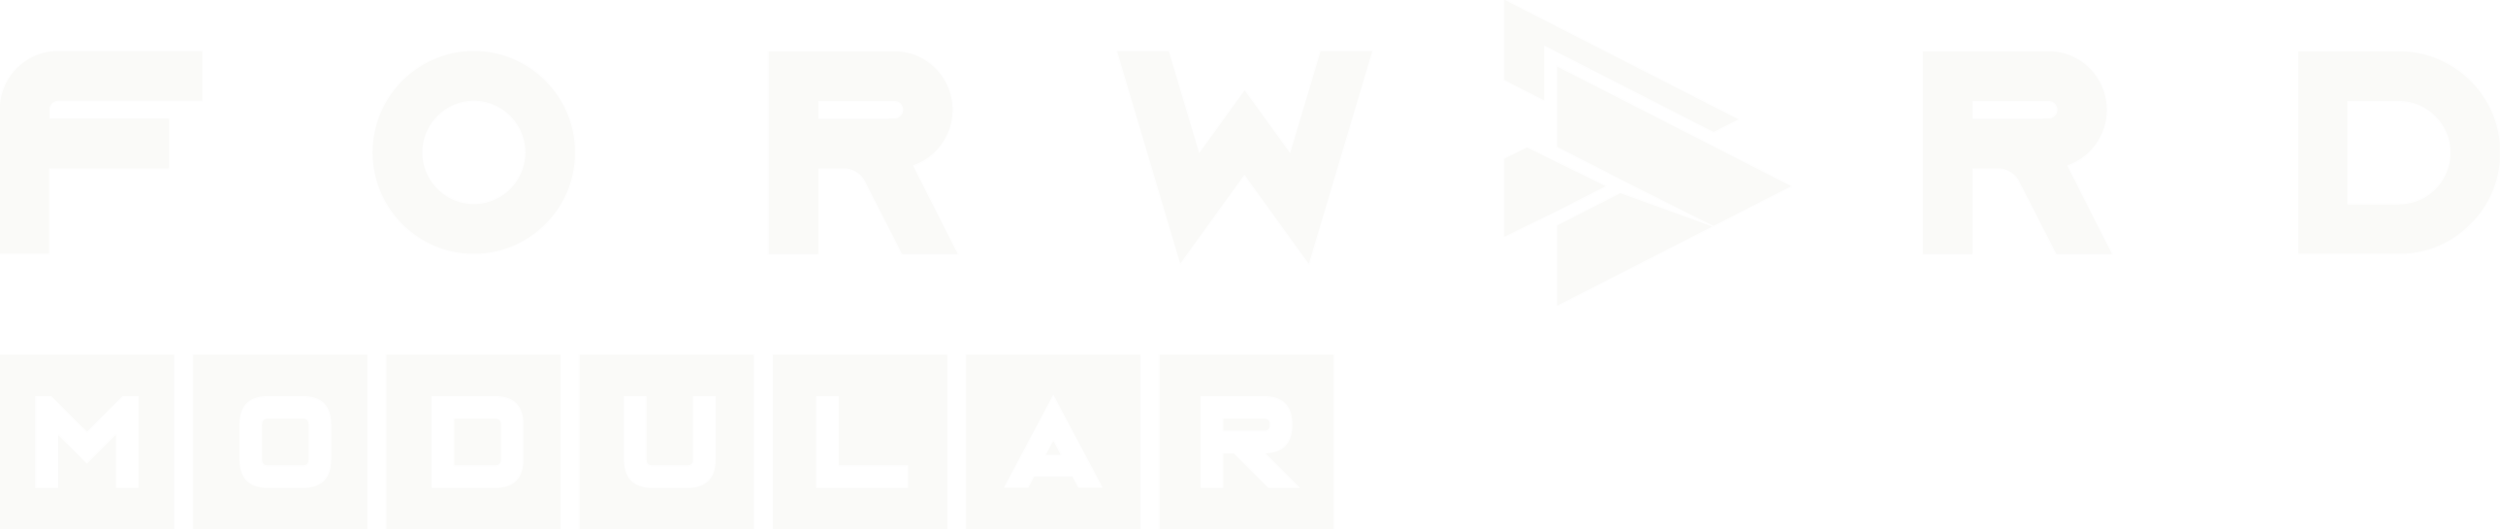 Forward Modular - 2019 Logo - KO.png